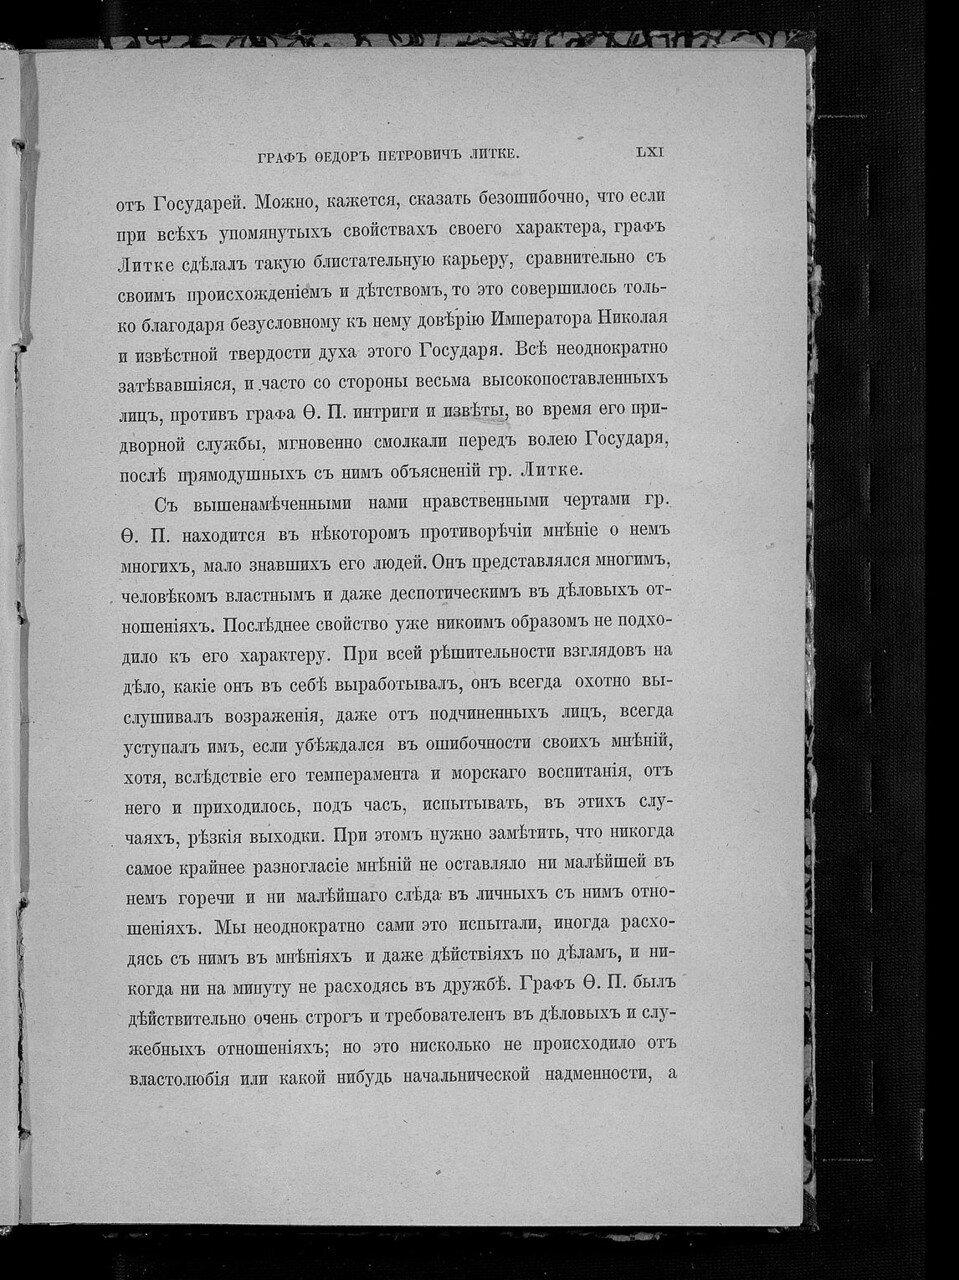 https://img-fotki.yandex.ru/get/742275/199368979.d3/0_21dd8e_4f745907_XXXL.jpg